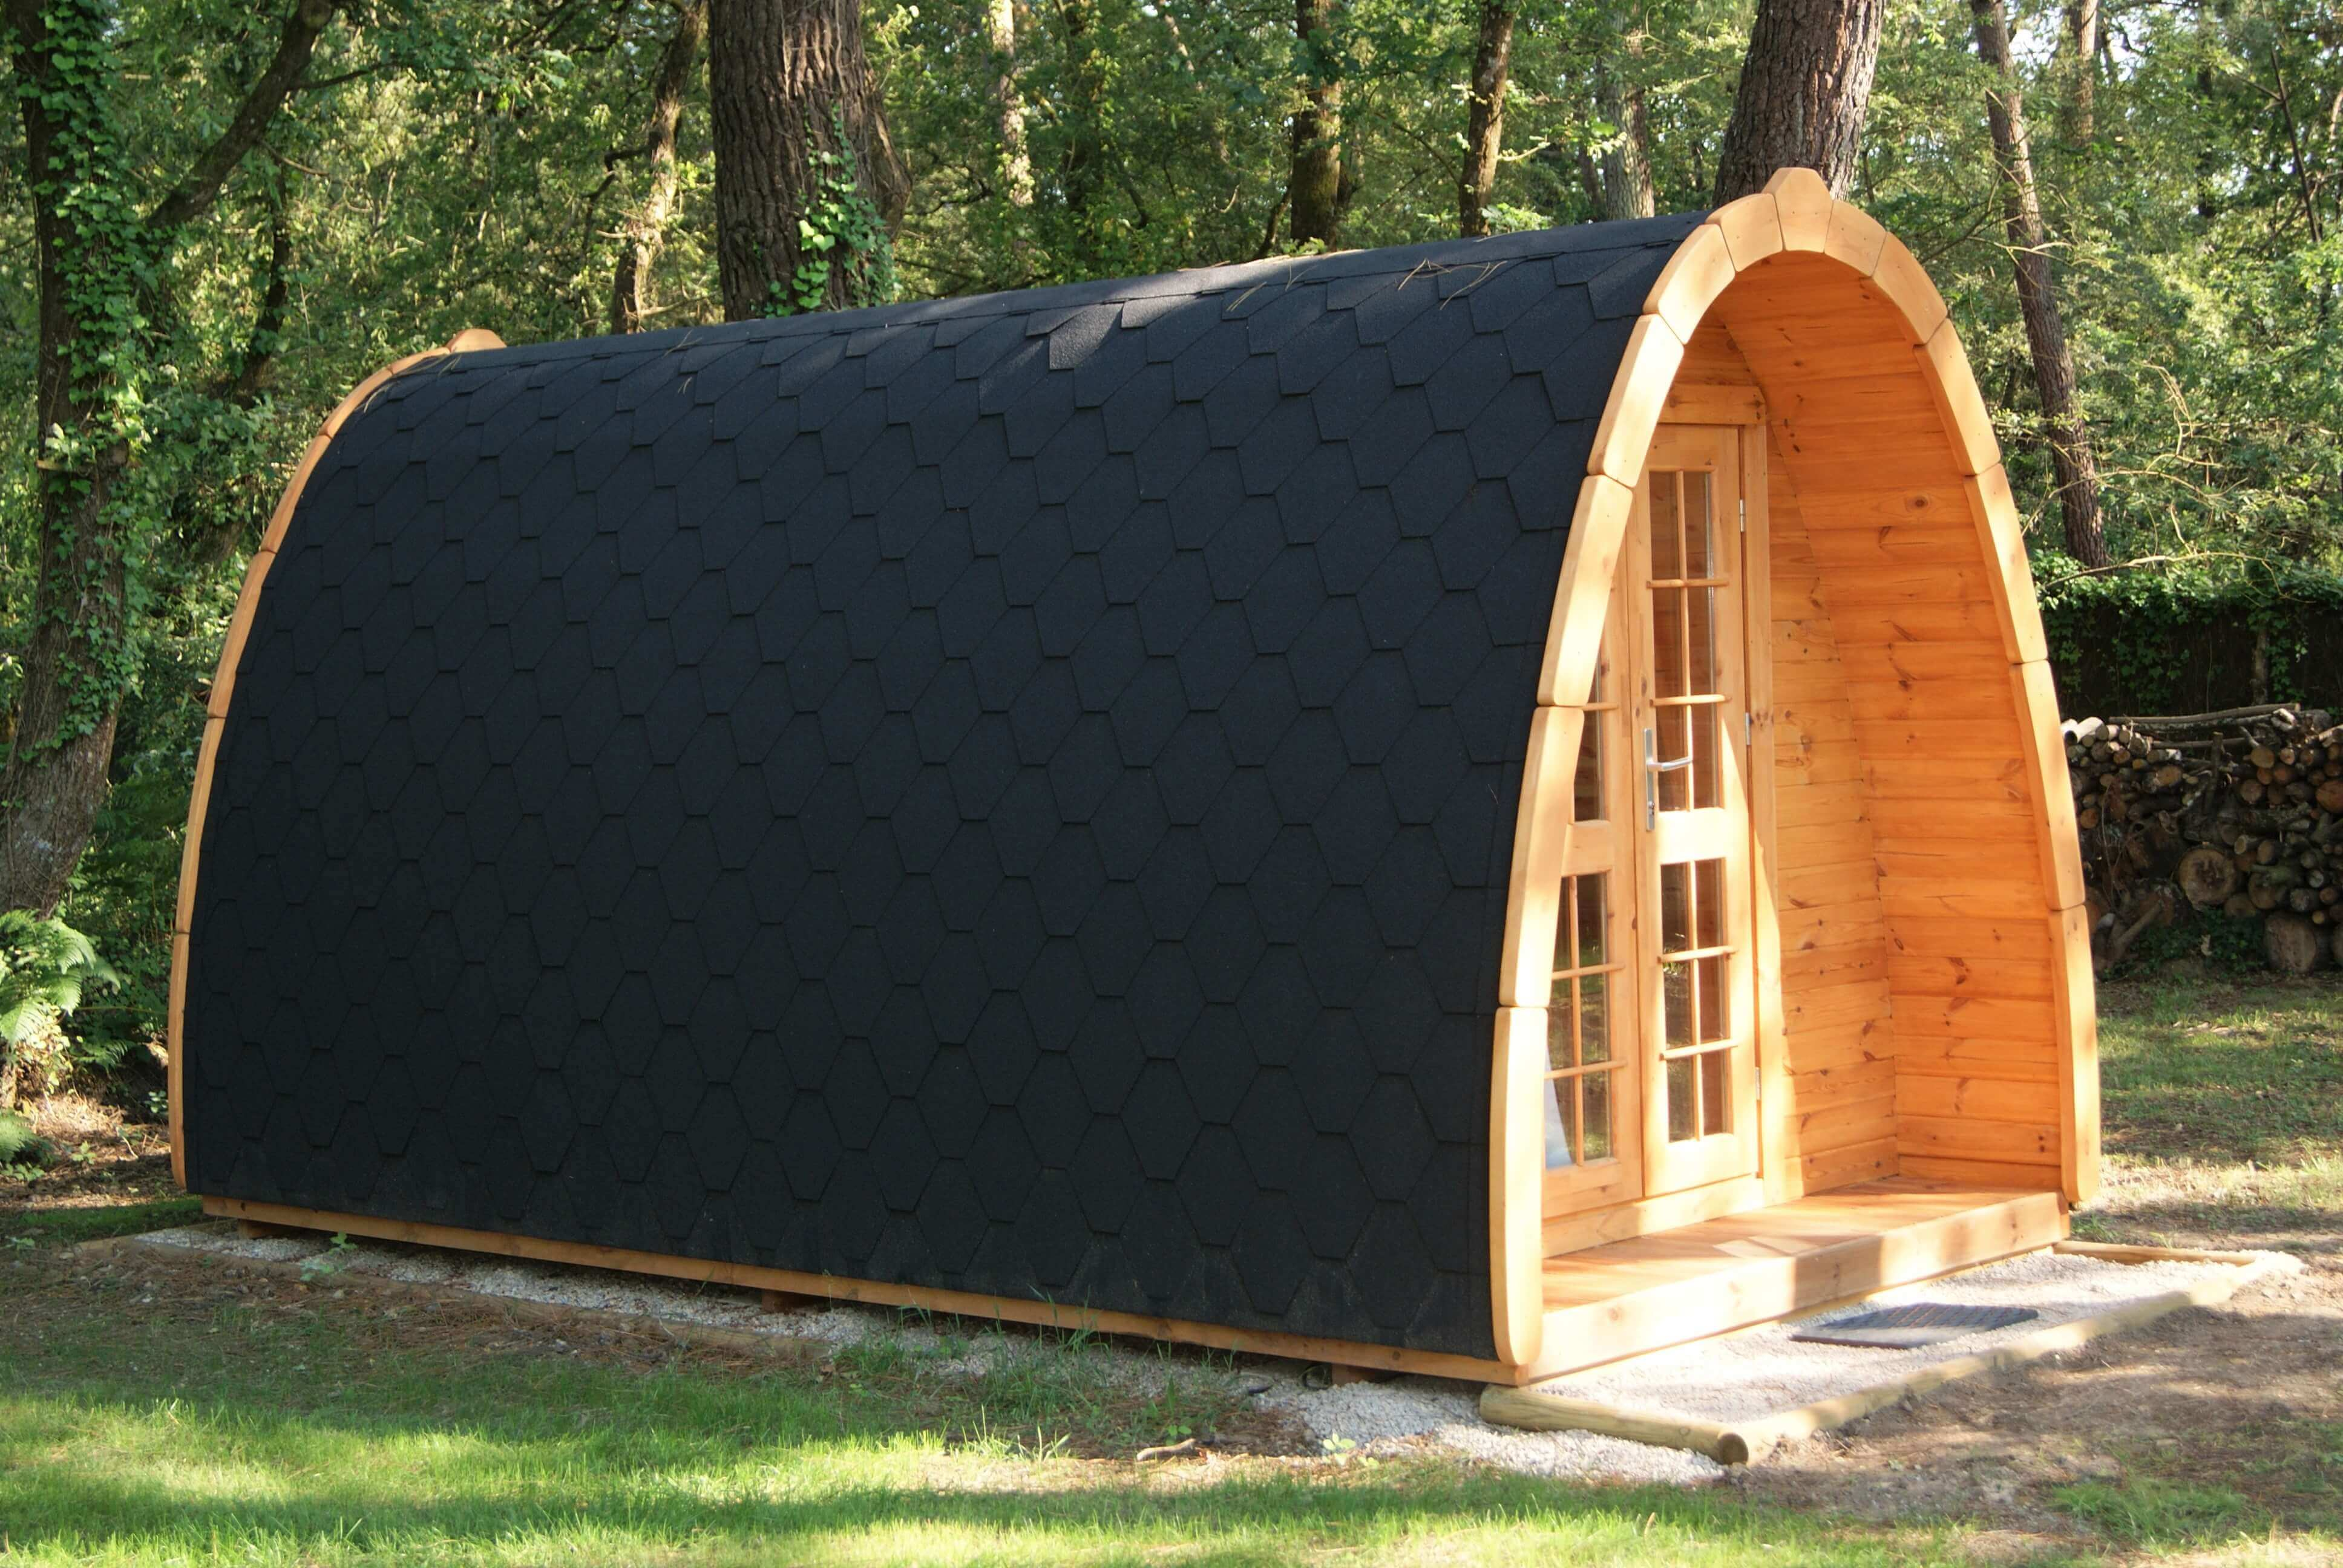 cabane en bois pod extérieur camping de kergo nature-carnac-auray-ploemel-morbihan